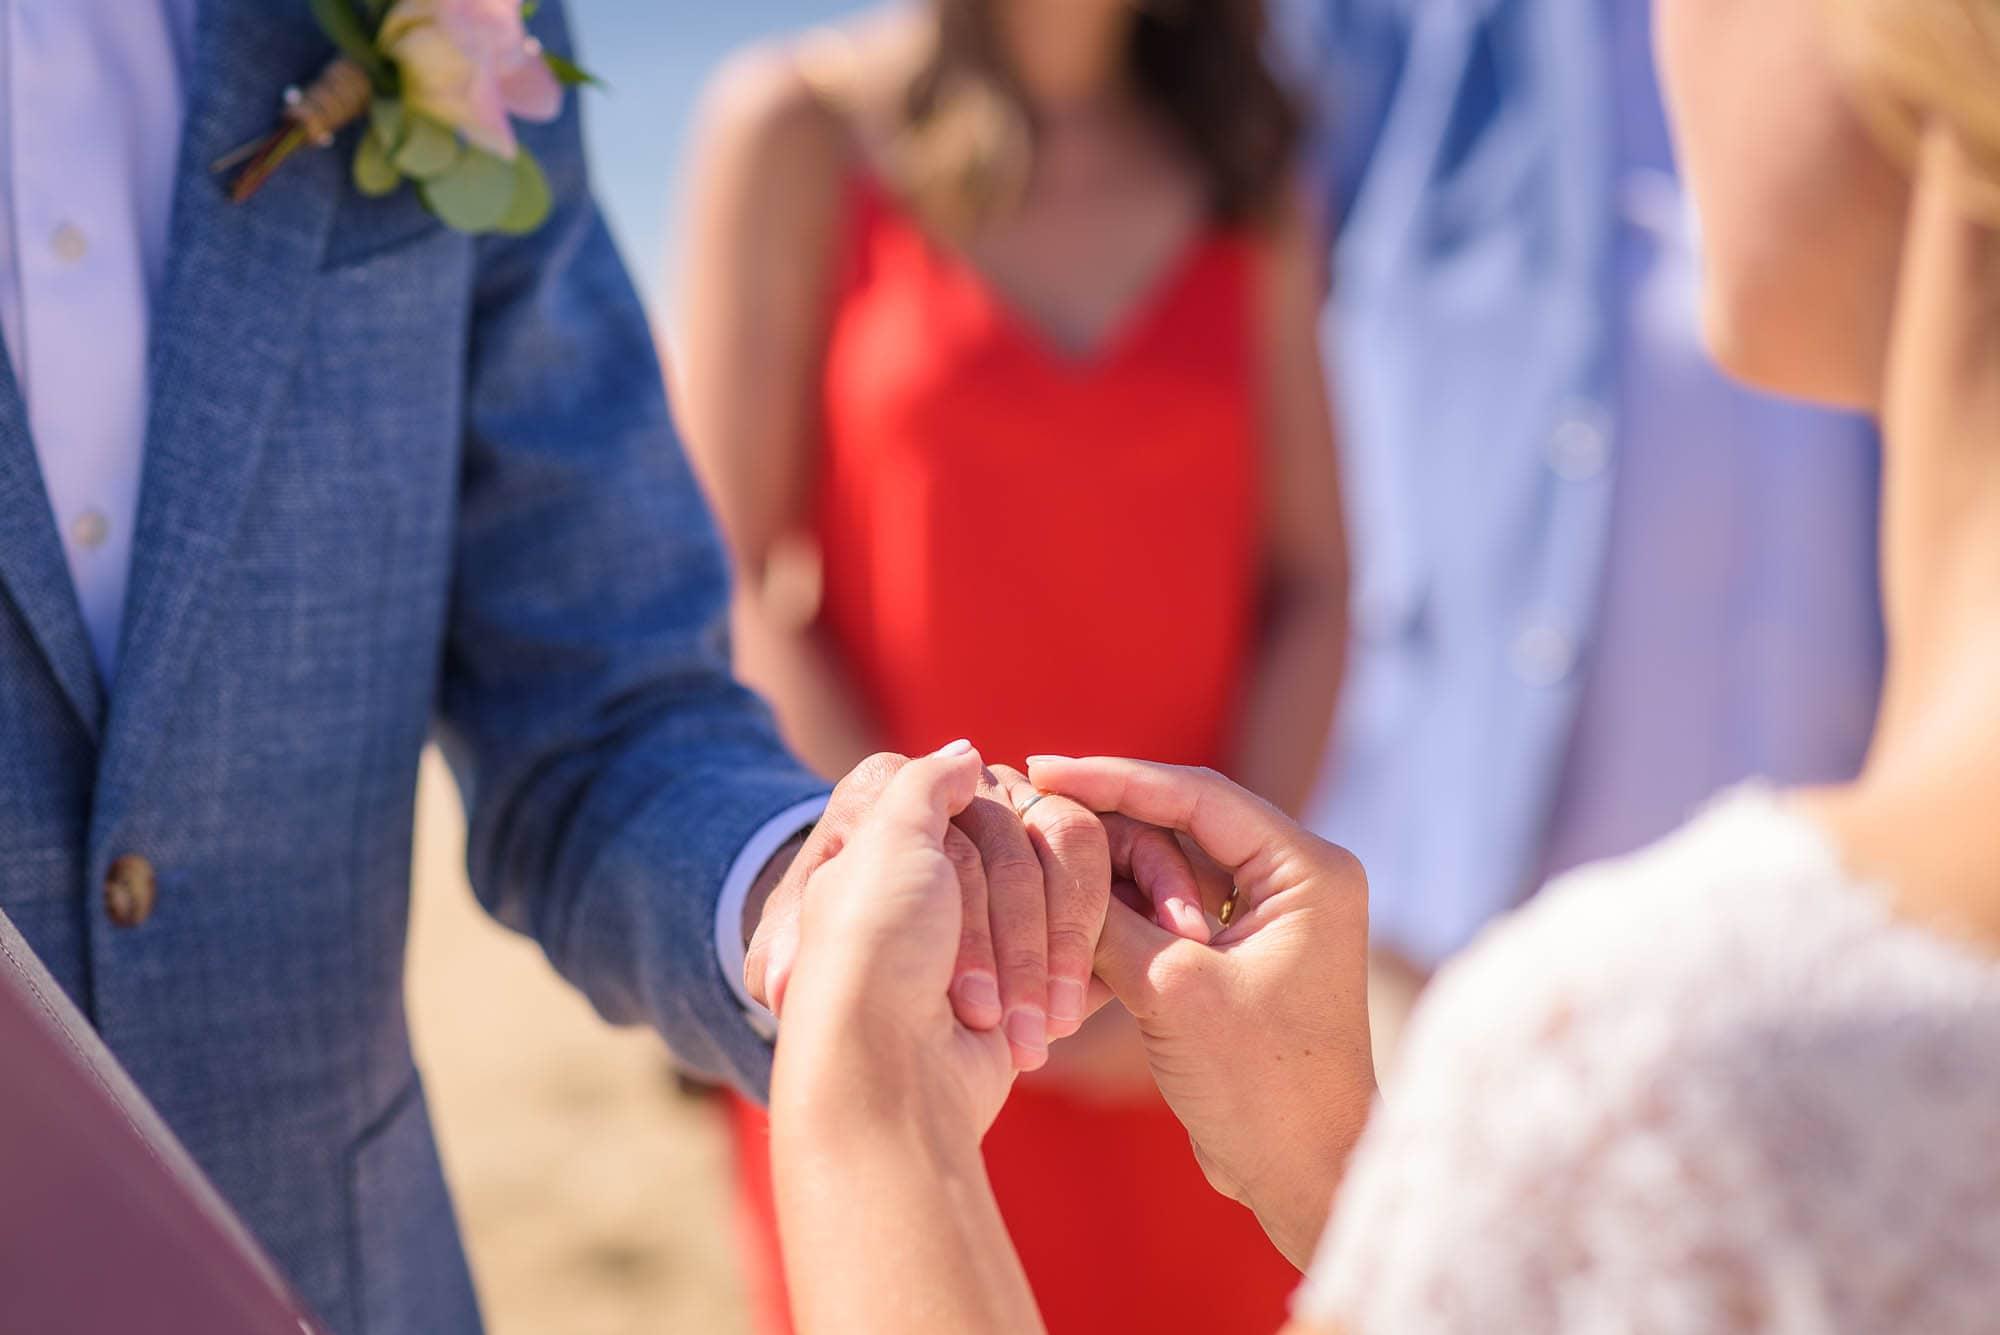 026_Alan_and_Heidi_Wedding_Verena_Andreas